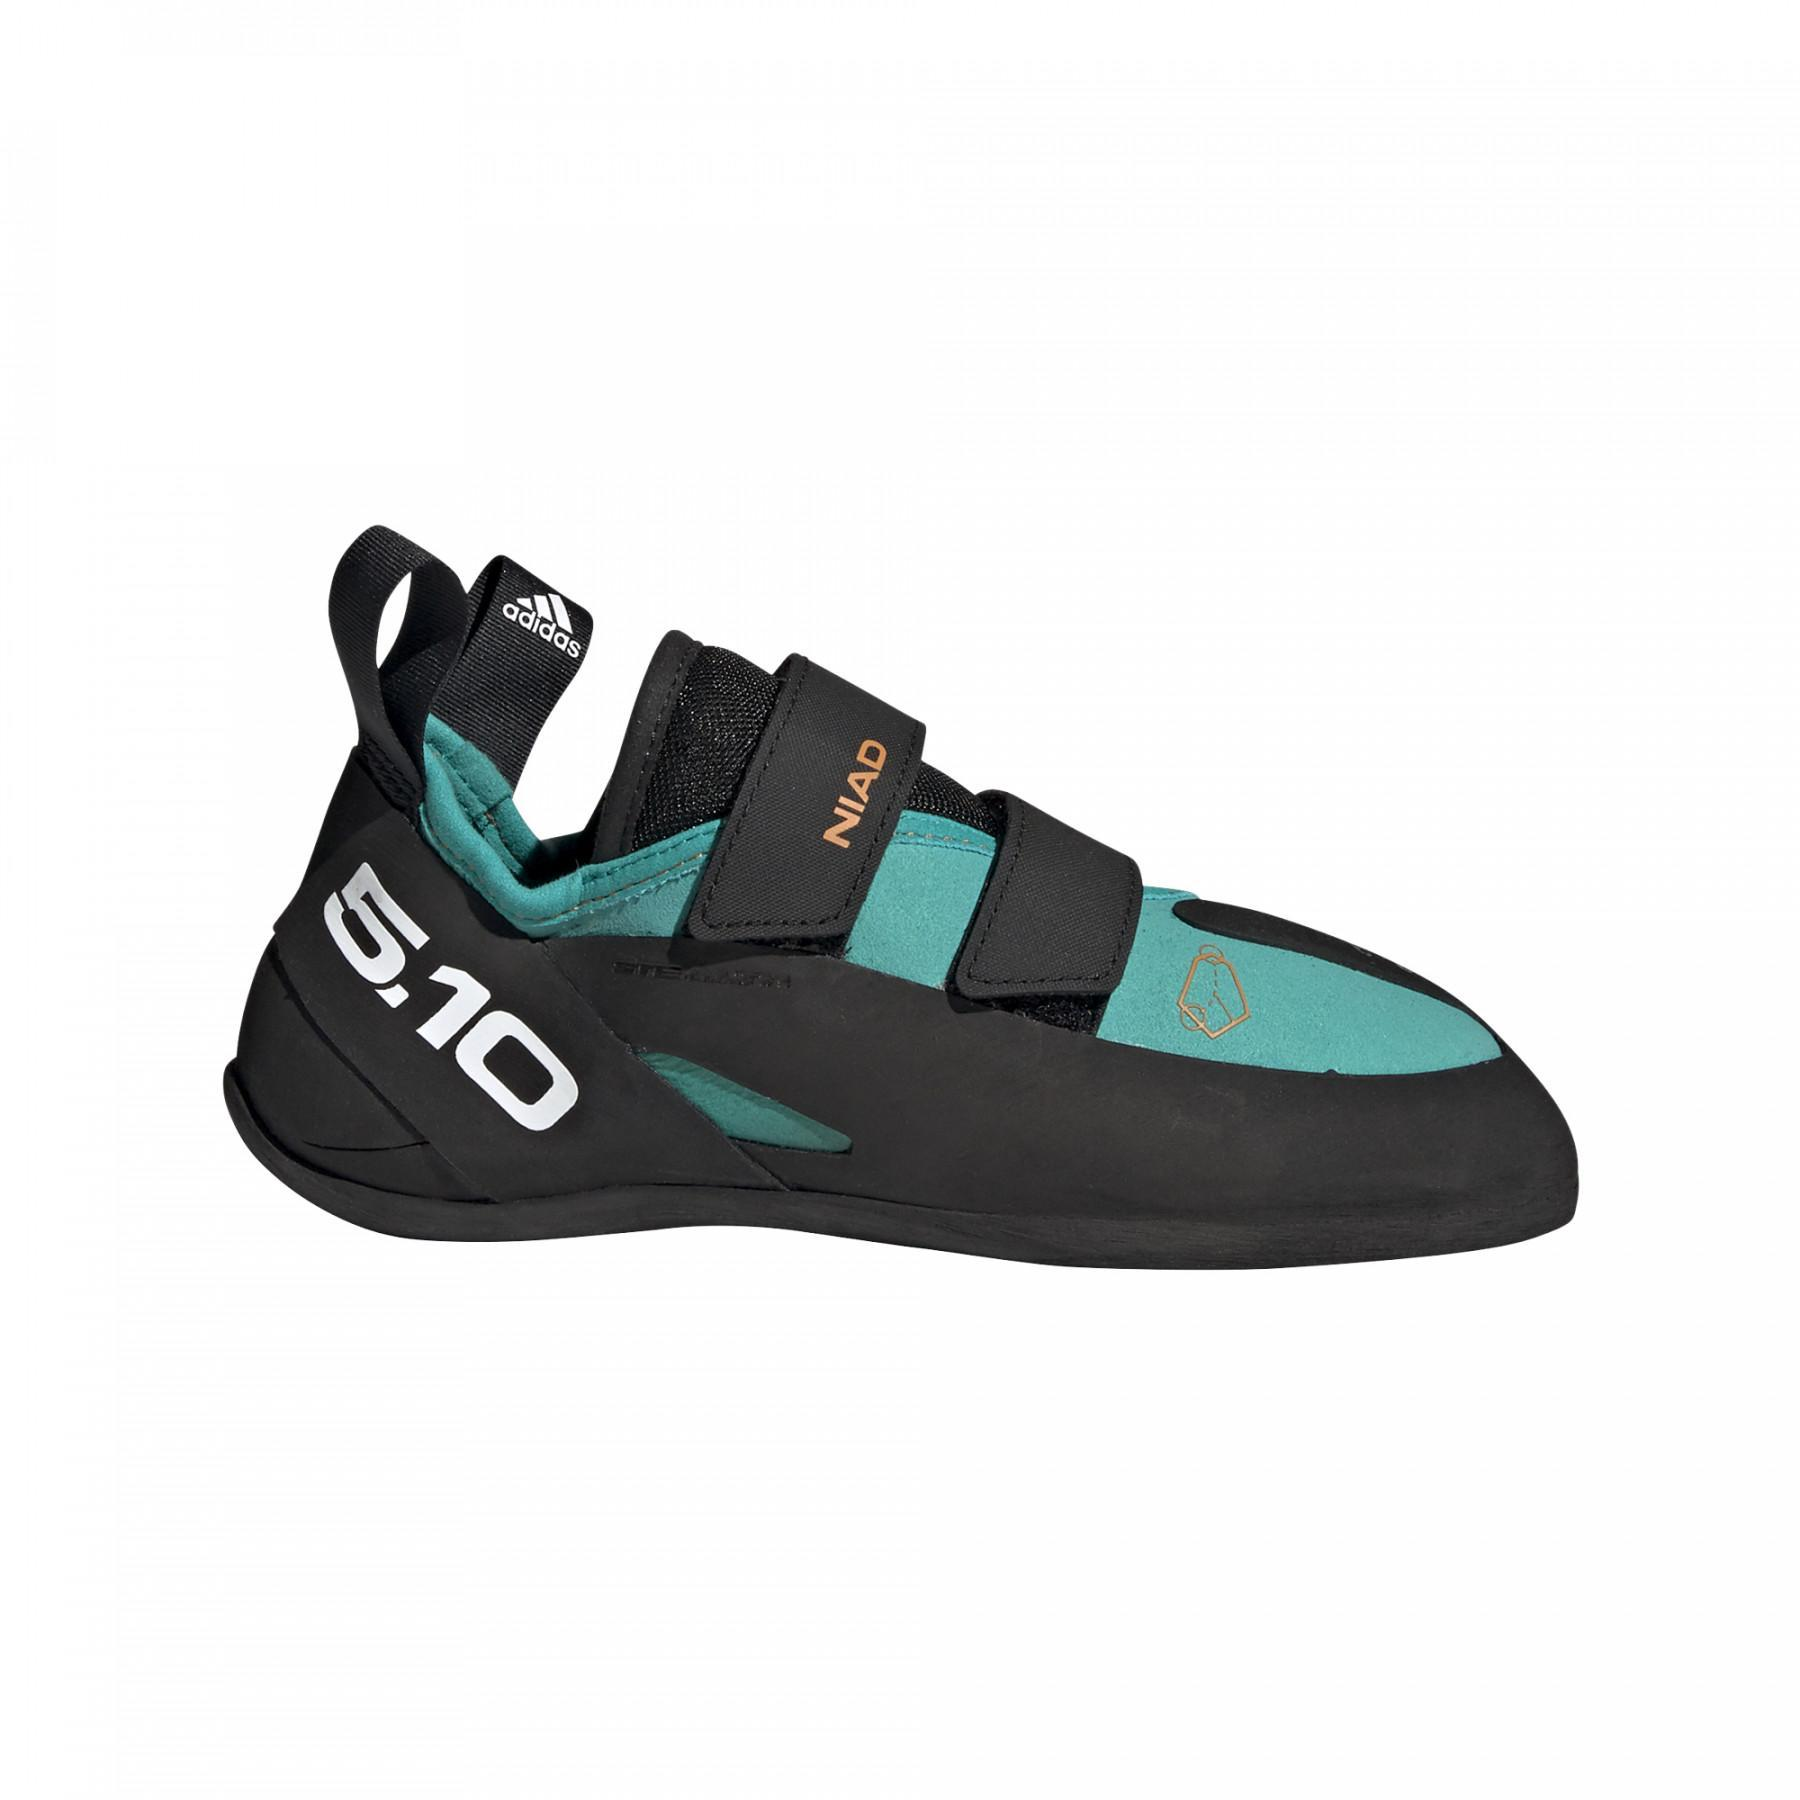 adidas Niad VCS Women's Shoes